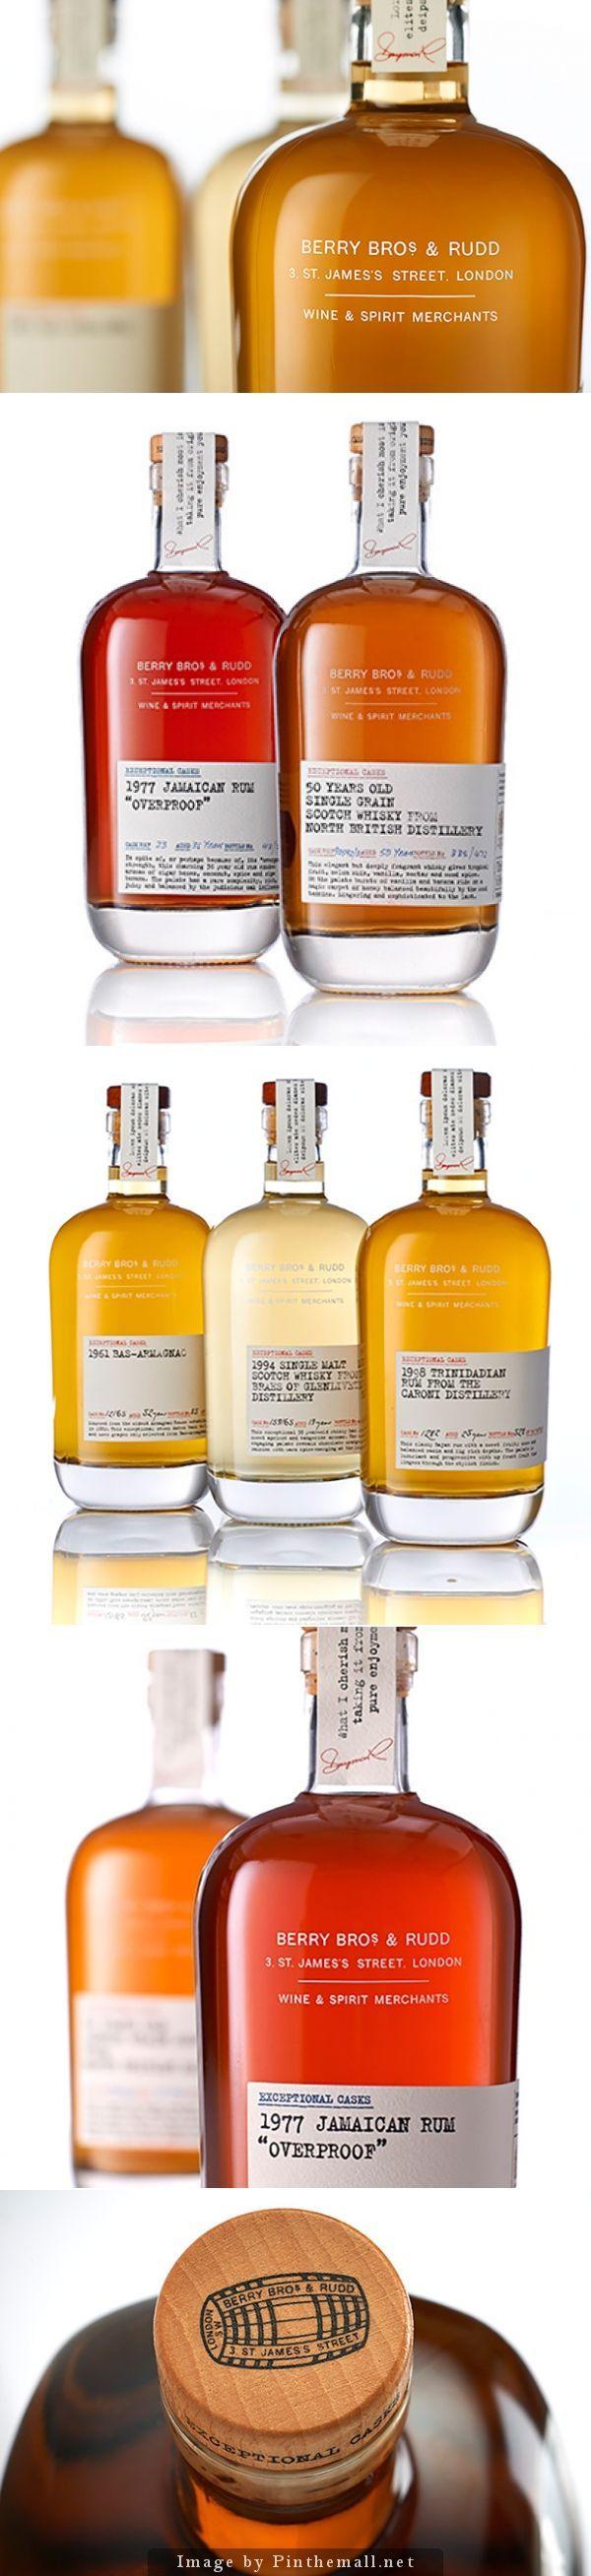 Berry Bros & Rudo / Wine & Spirit Merchants #packaging